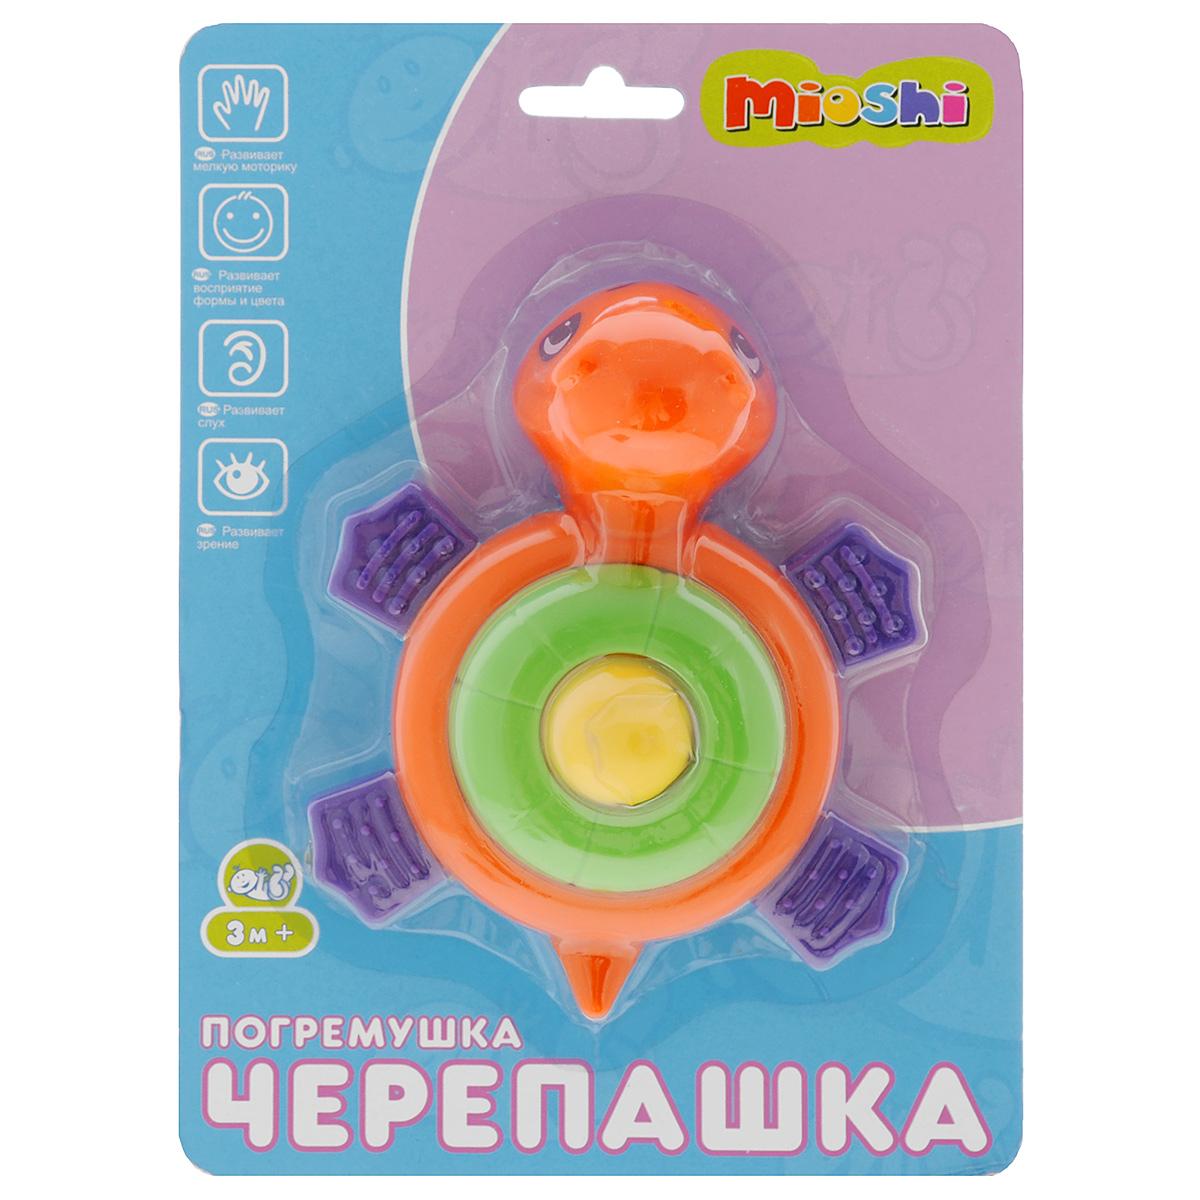 Развивающая игрушка-погремушка Mioshi Черепашка развивающая игрушка погремушка mioshi черепашка